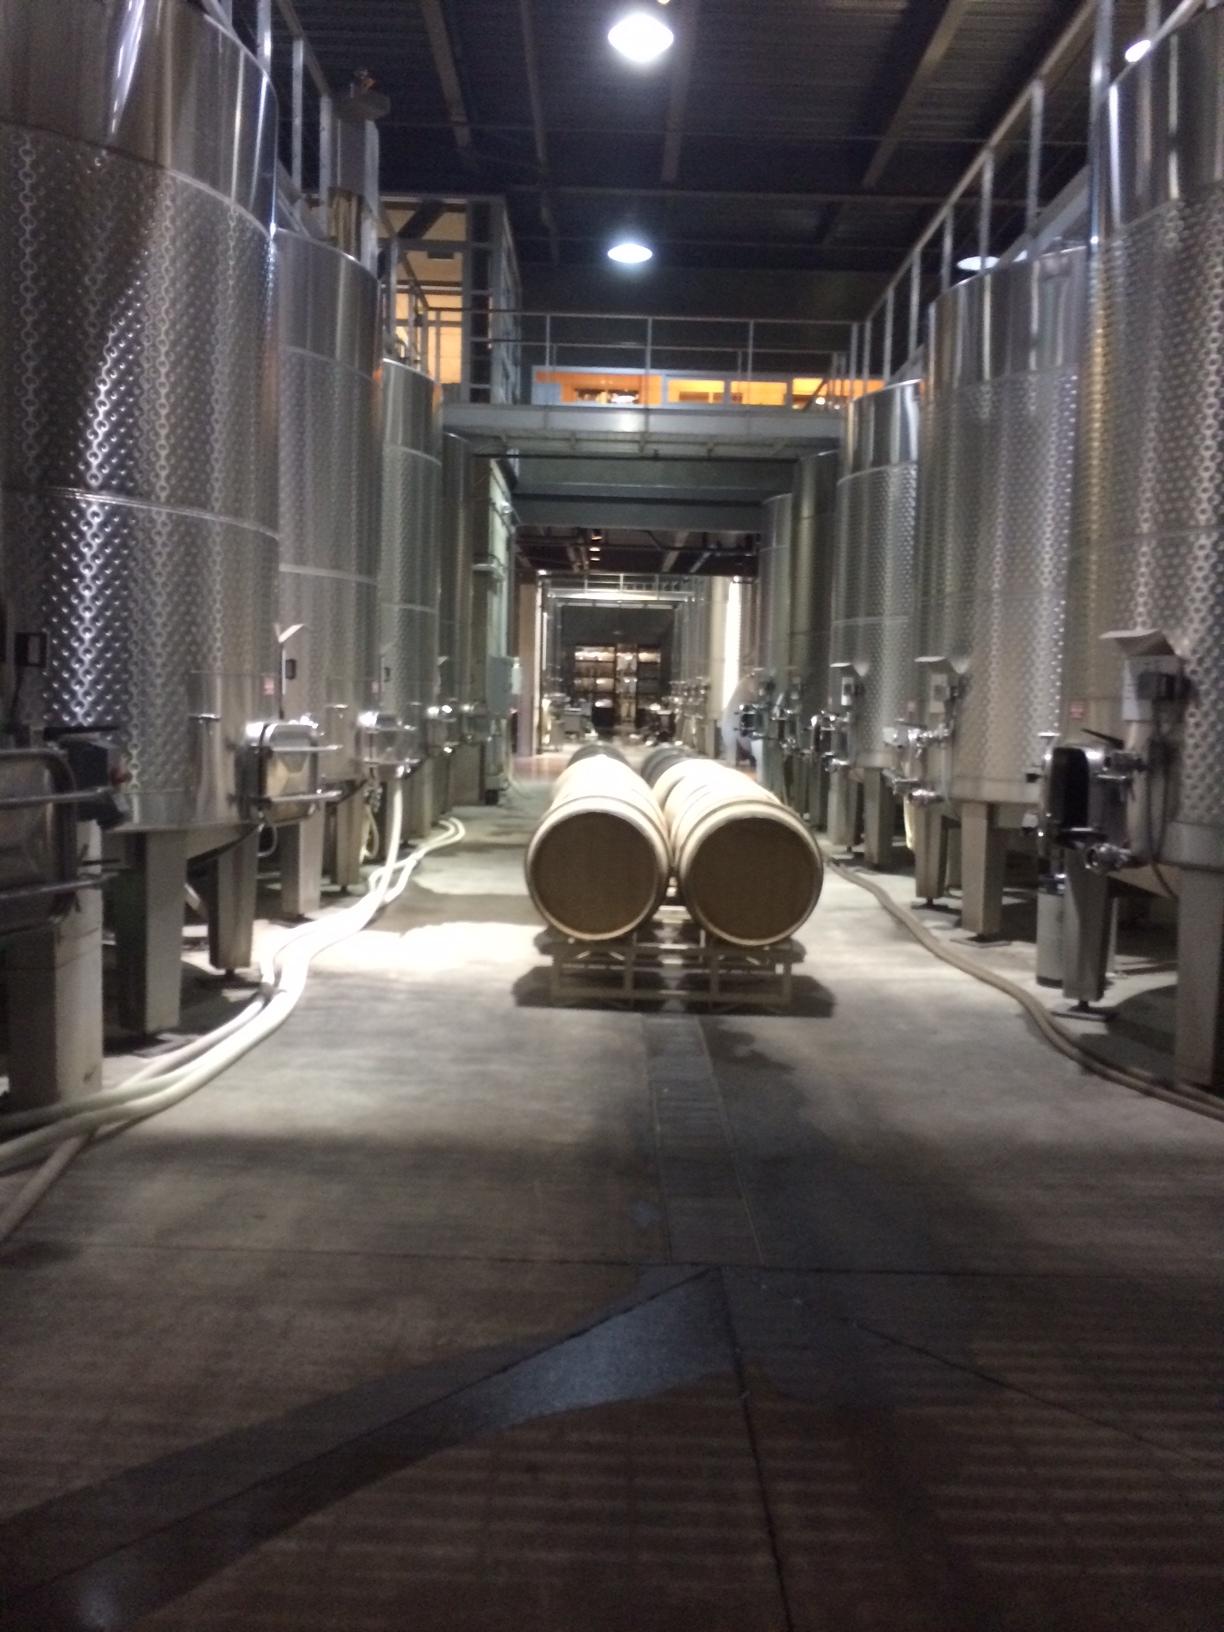 Fermentation happening in stainless steel tanks.